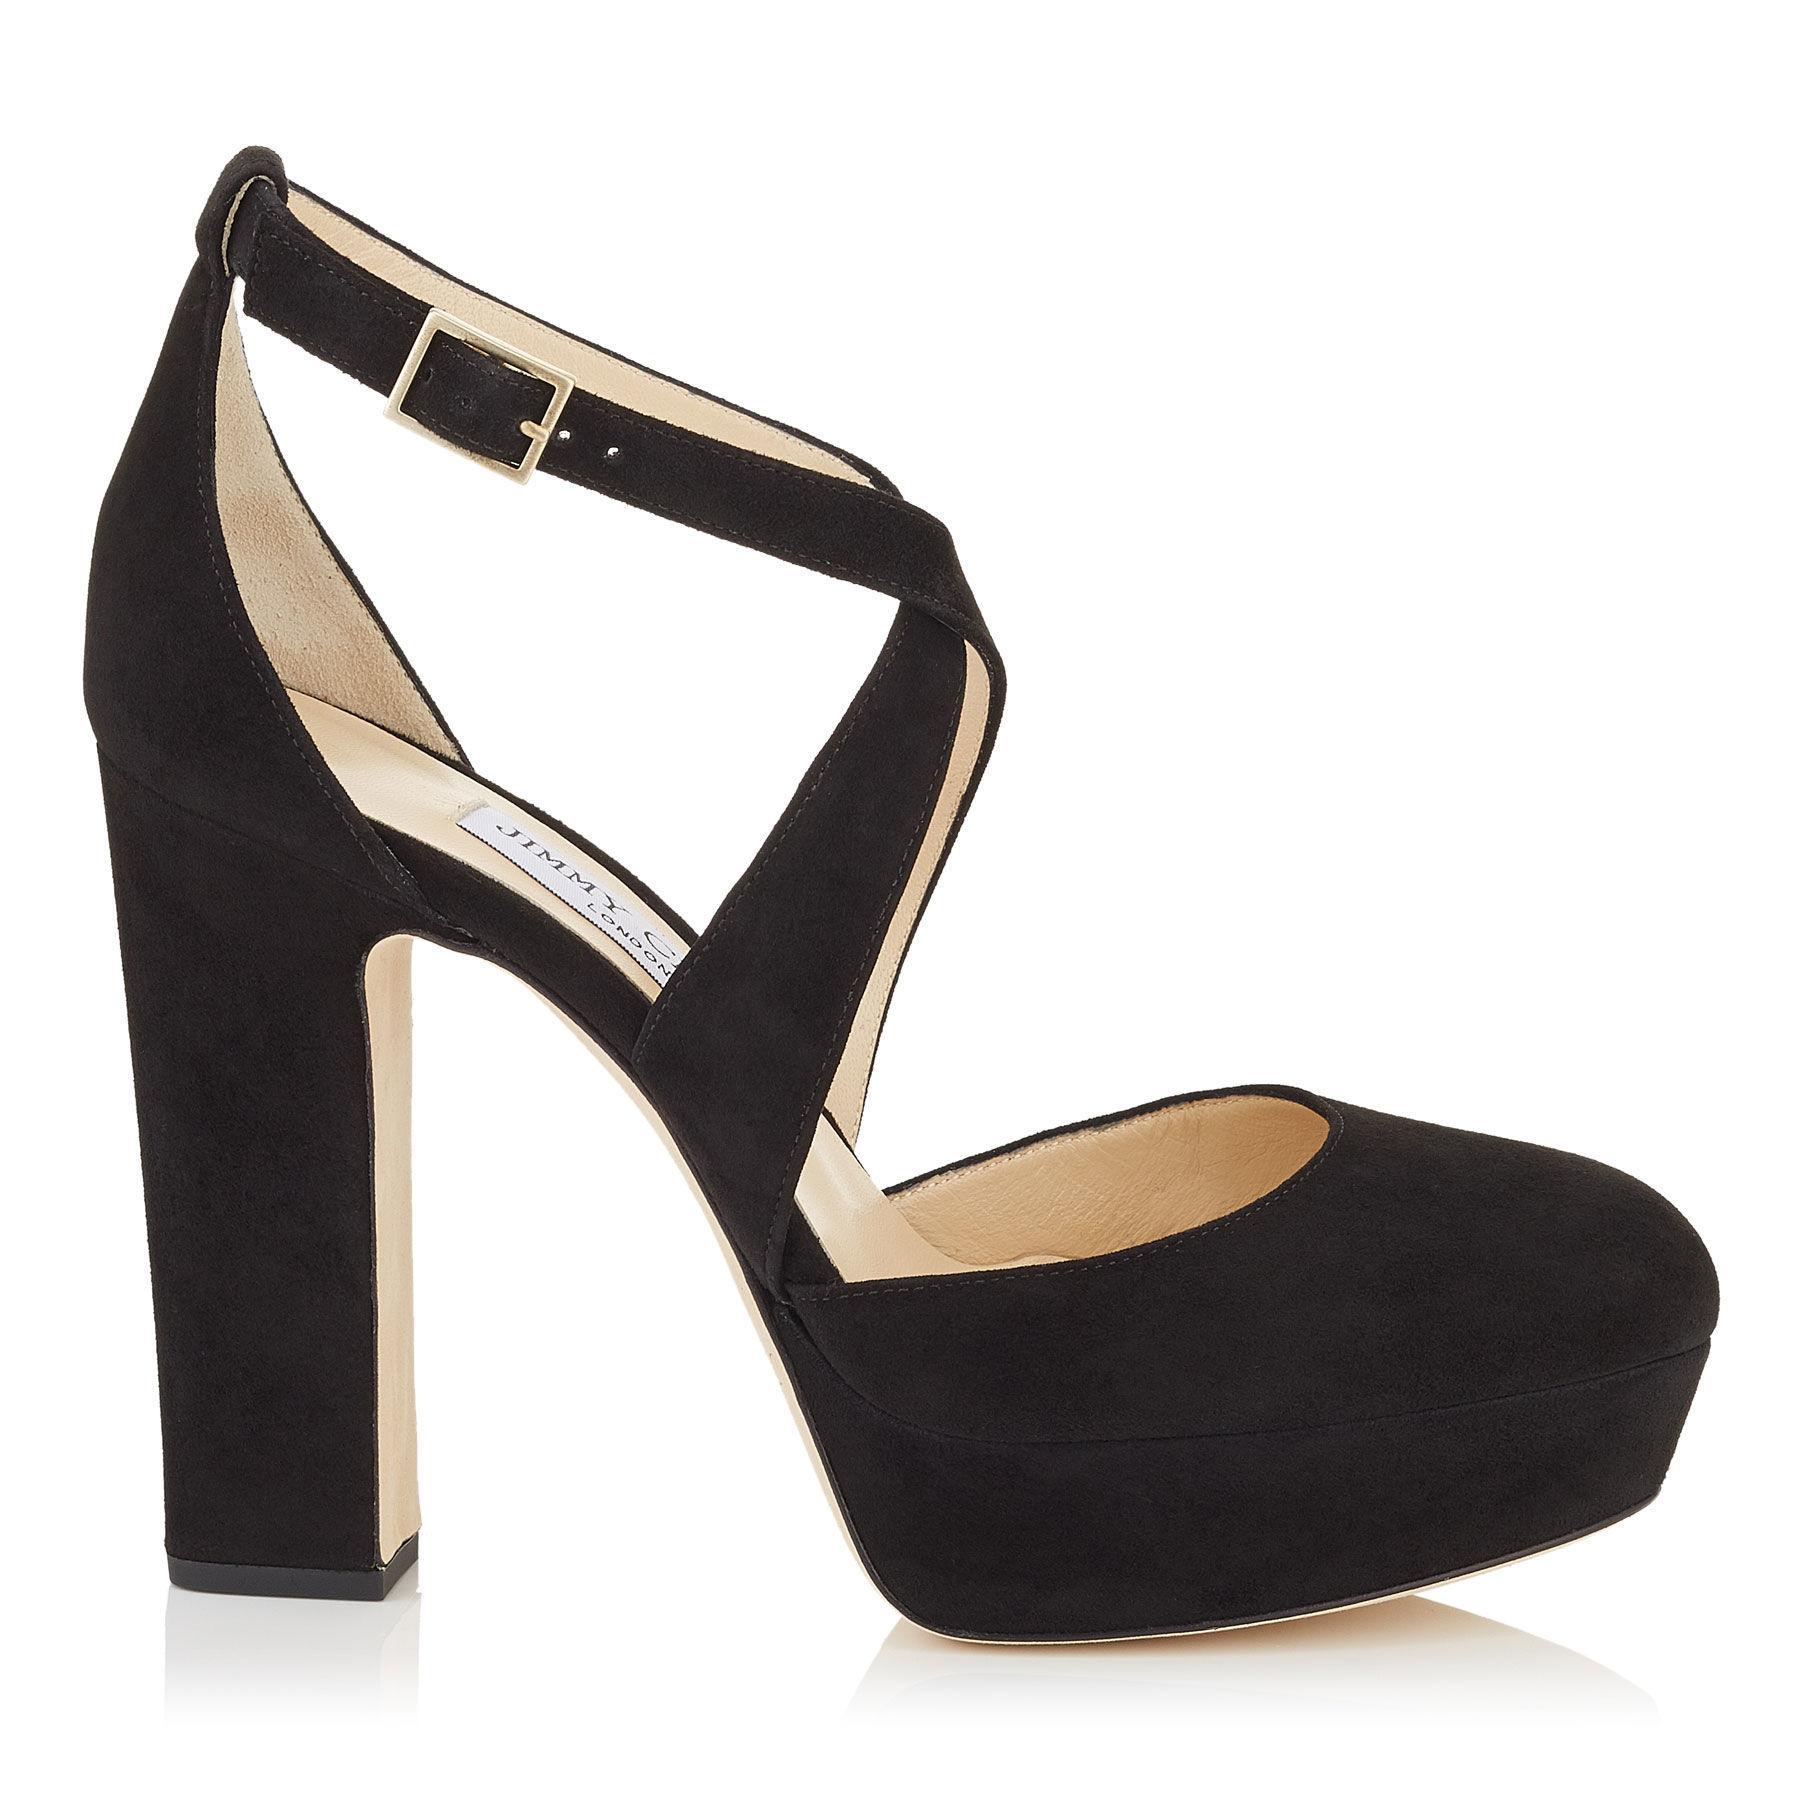 Pre-owned - Exotic leathers heels Jimmy Choo London Fu1Iov